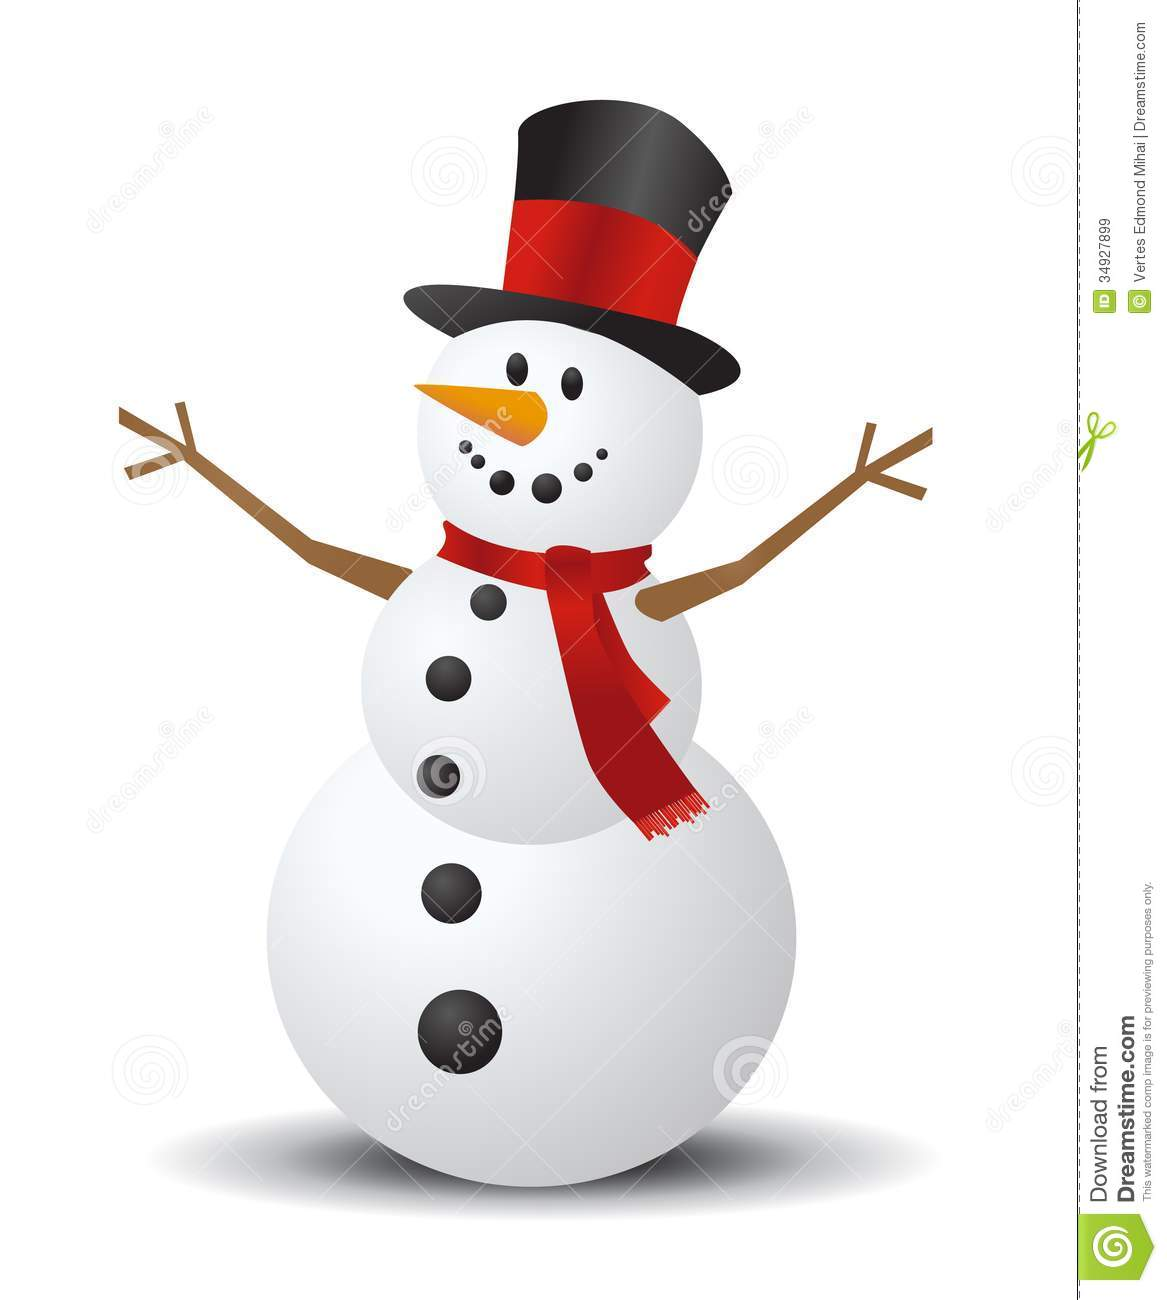 Christmas Snowman Clipart - Clipart Kid